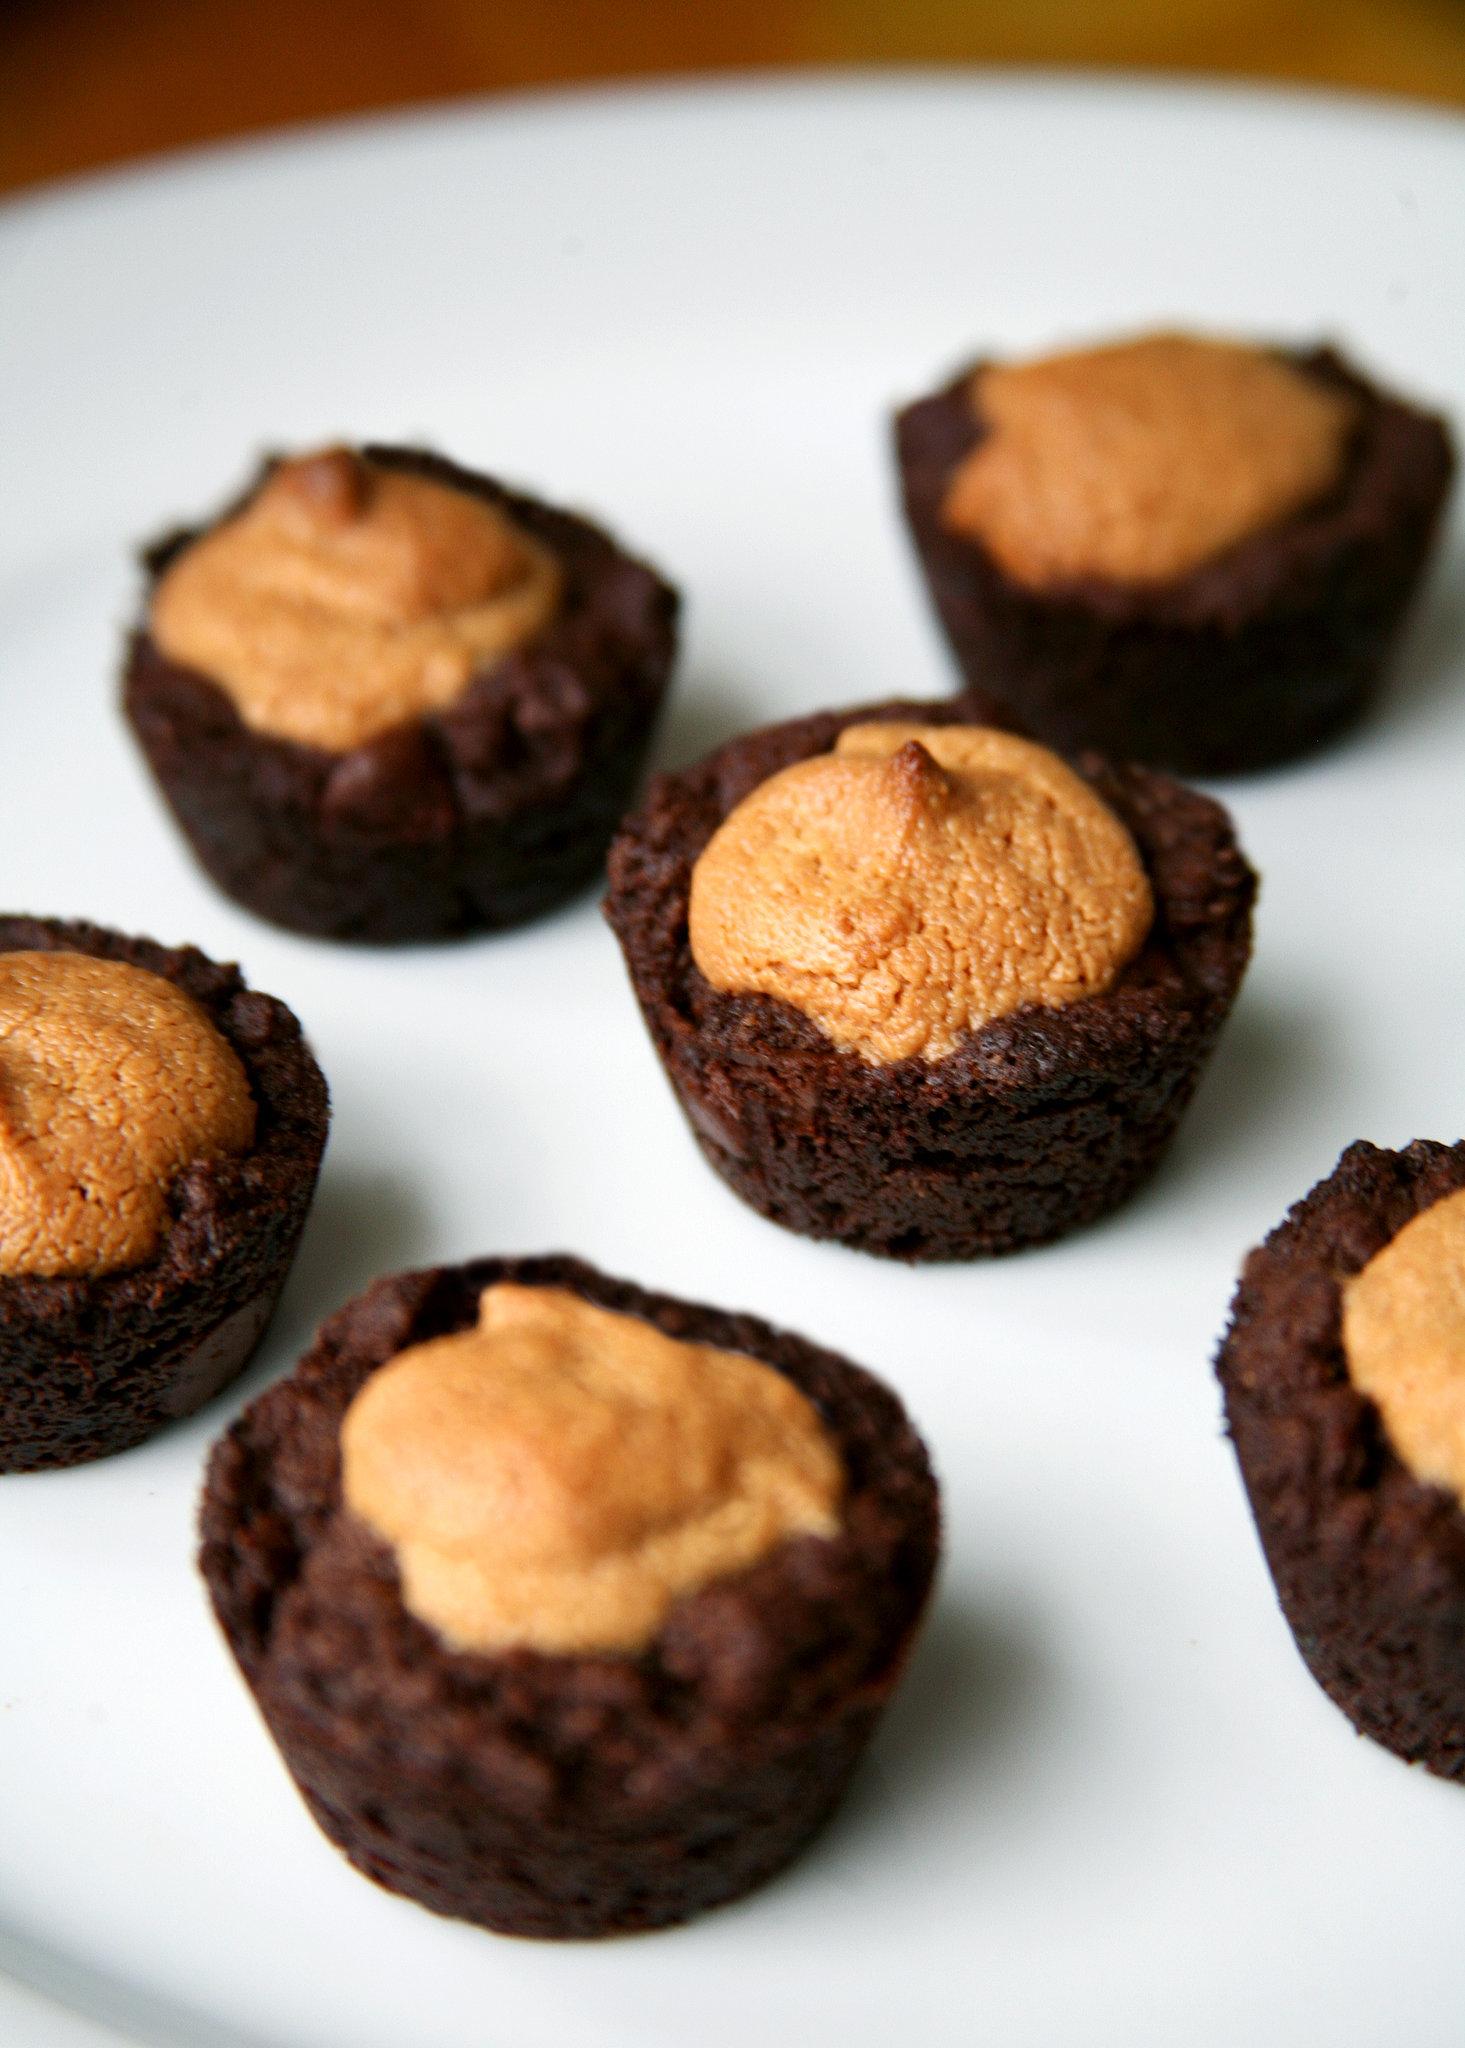 Healthy dessert recipes vegan peanut butter brownies for Dessert recipes using peanut butter